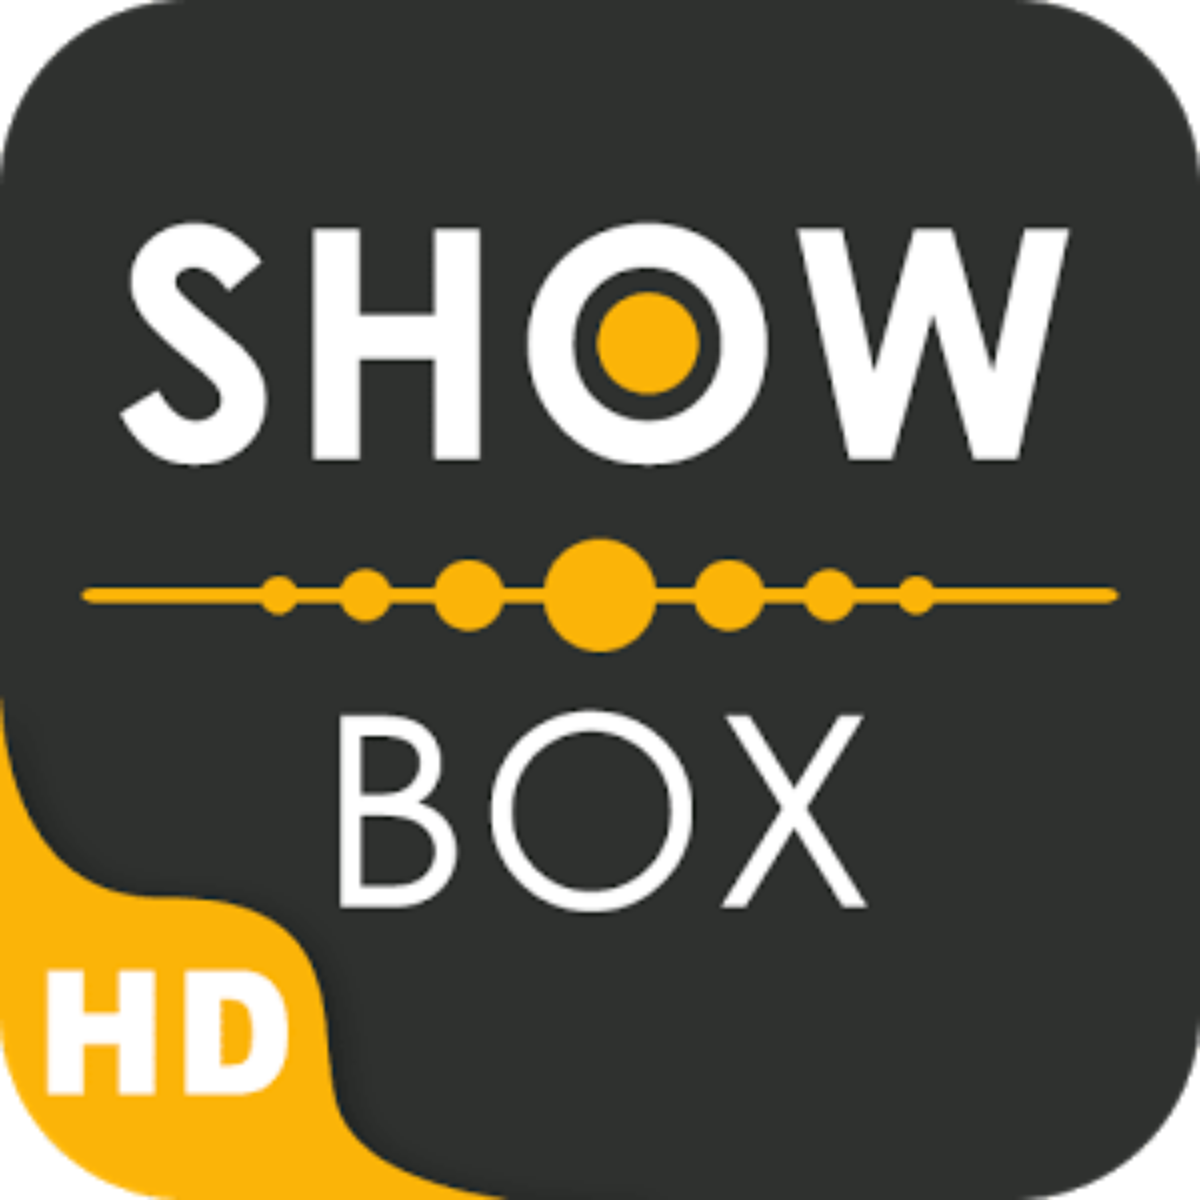 New Movie Box Show HD Guide